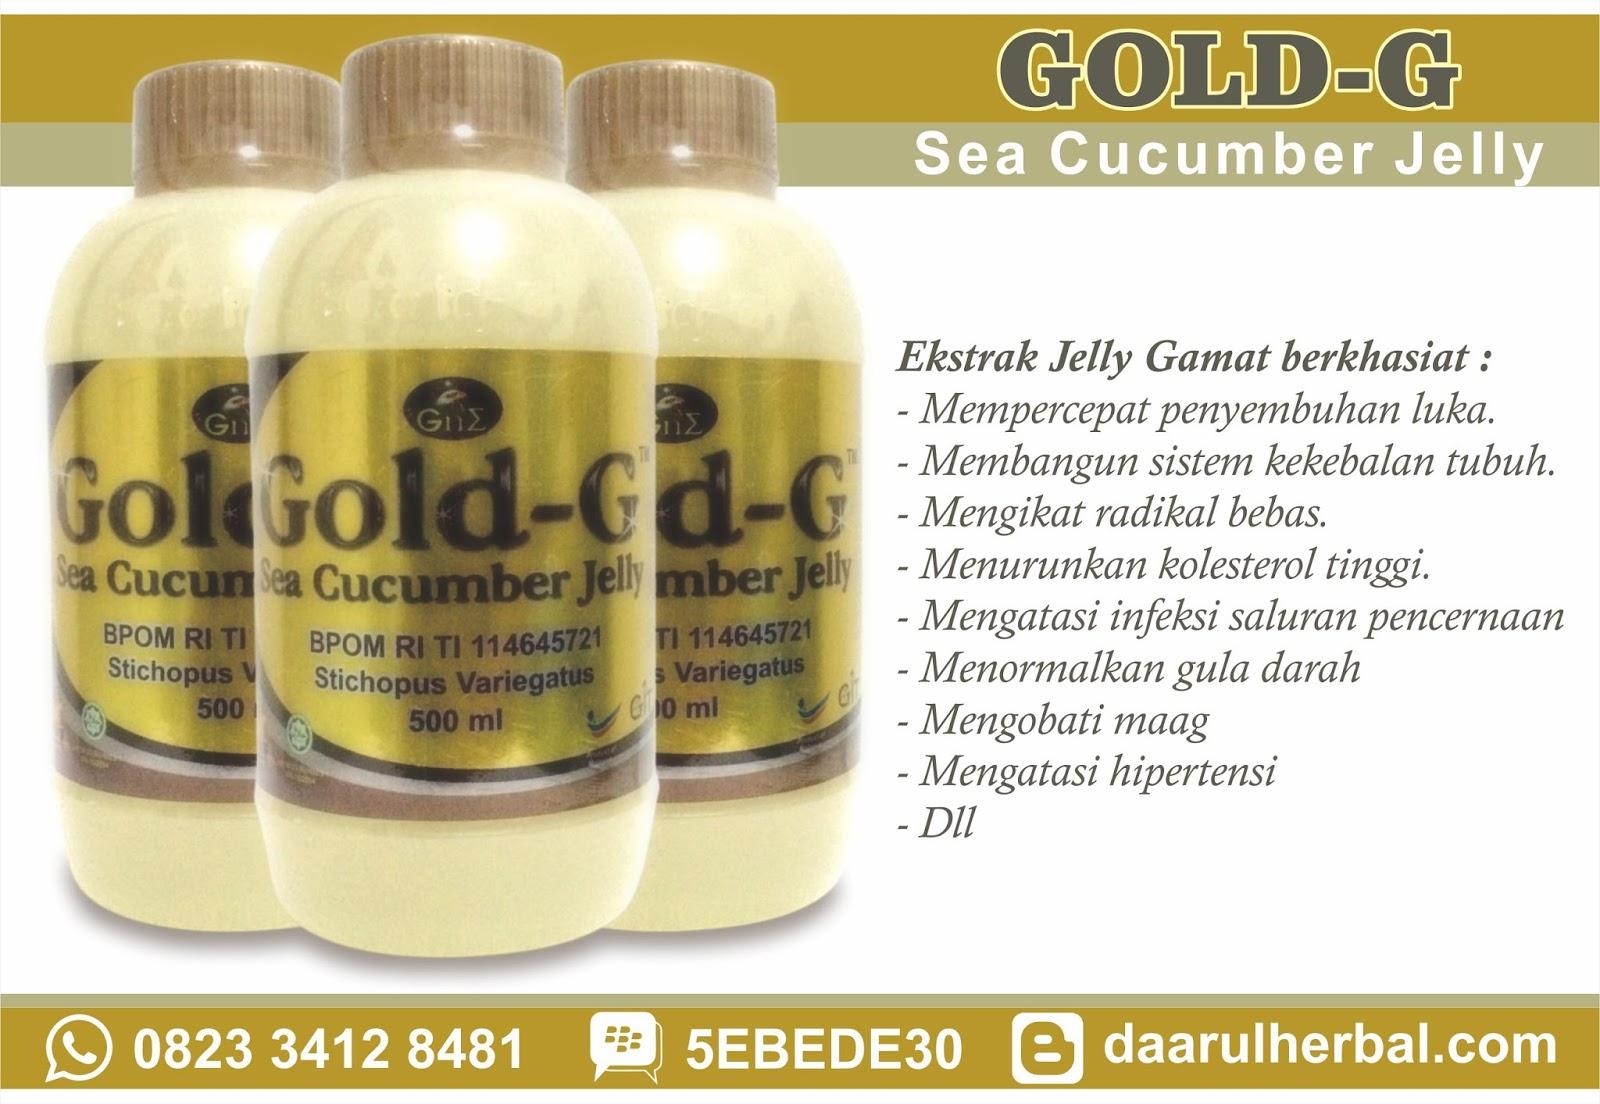 Gold G Jelly Gamat Cucumber Ekstrak Gamatteripang Emas 500 Ml Best Seller 500m Harga Rp195000